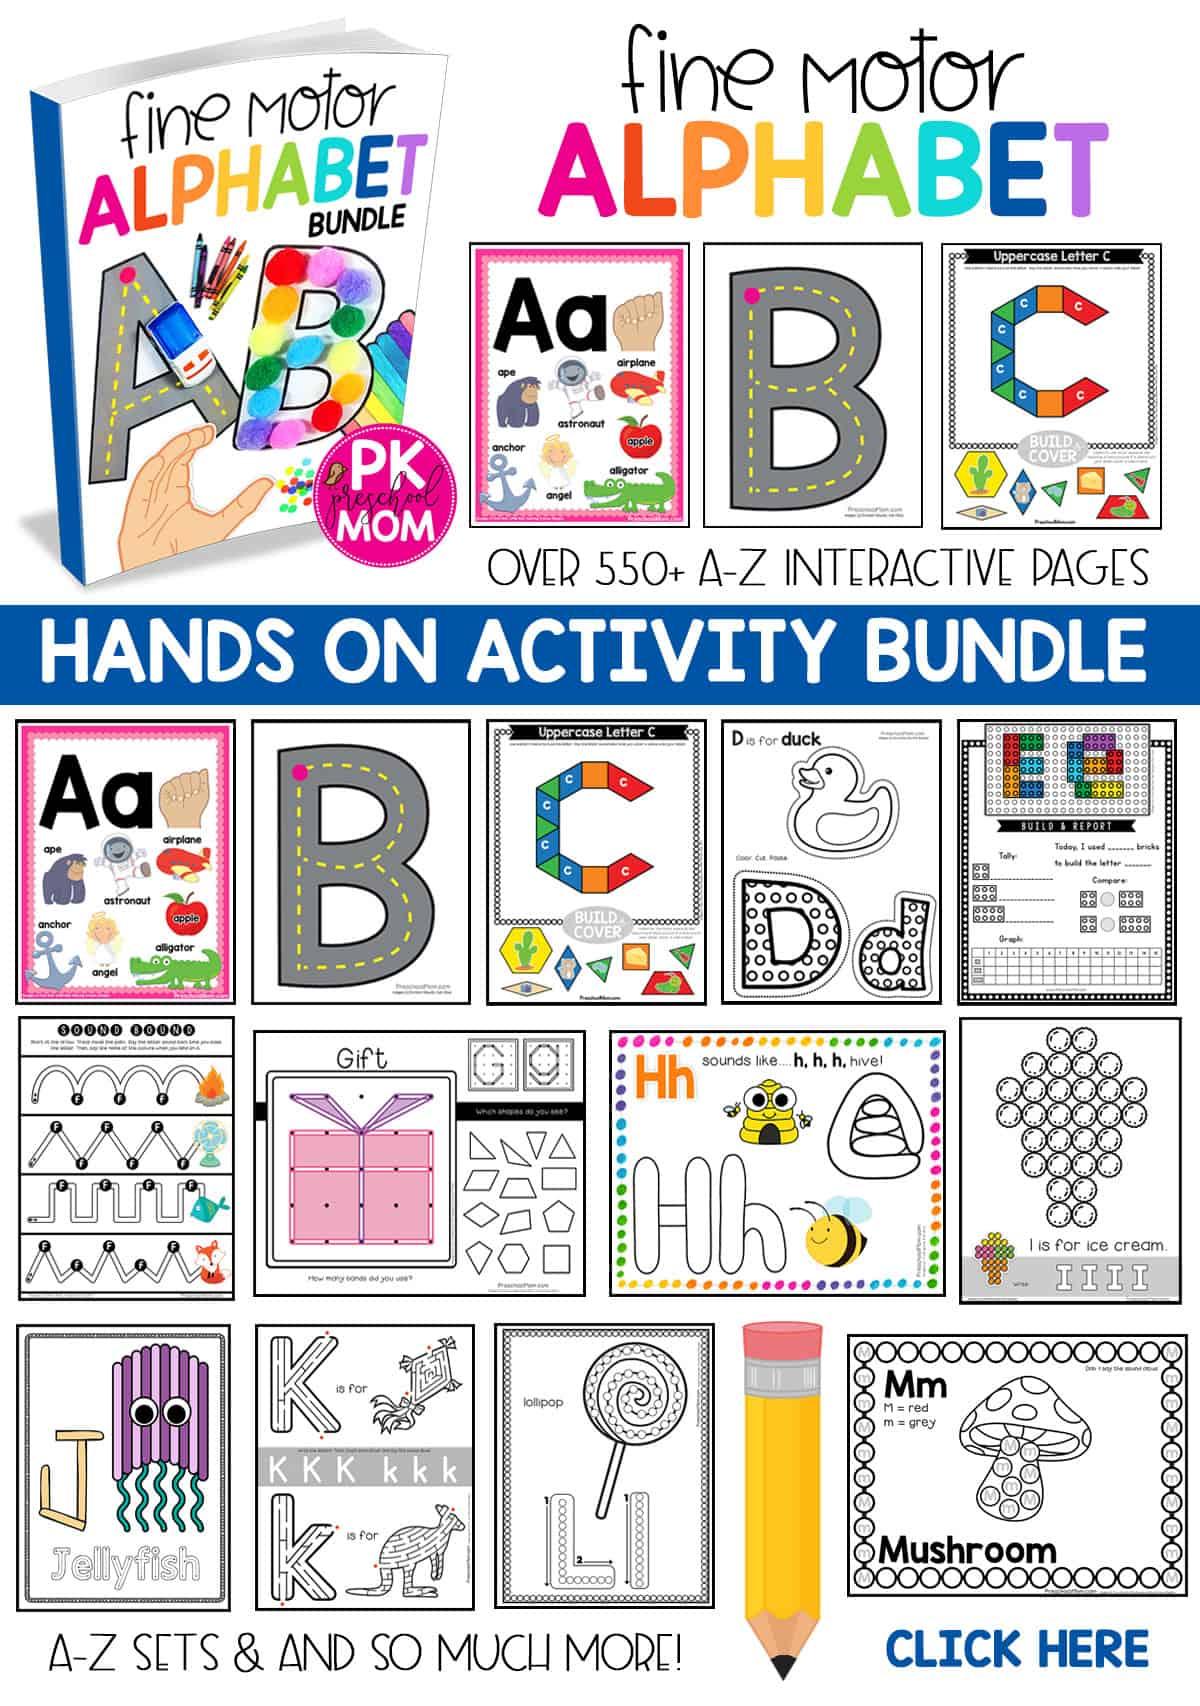 Free Color Words Coloring Pages Preschool Mom